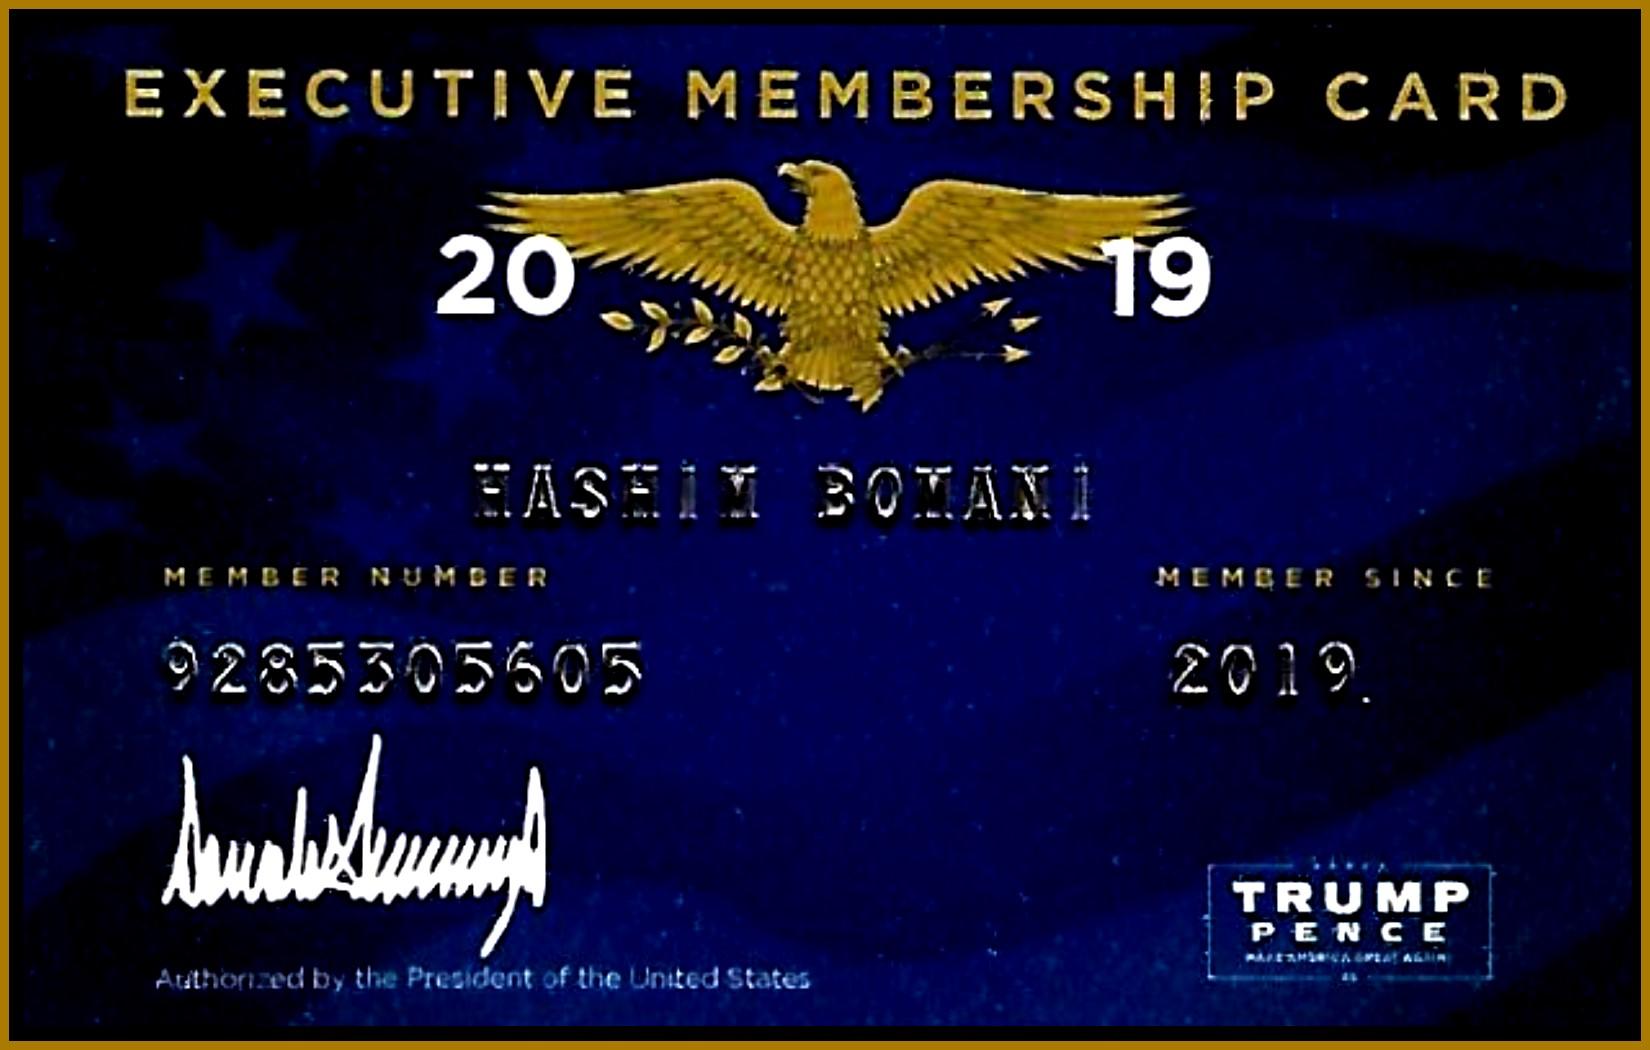 EXECUTIVE CARD